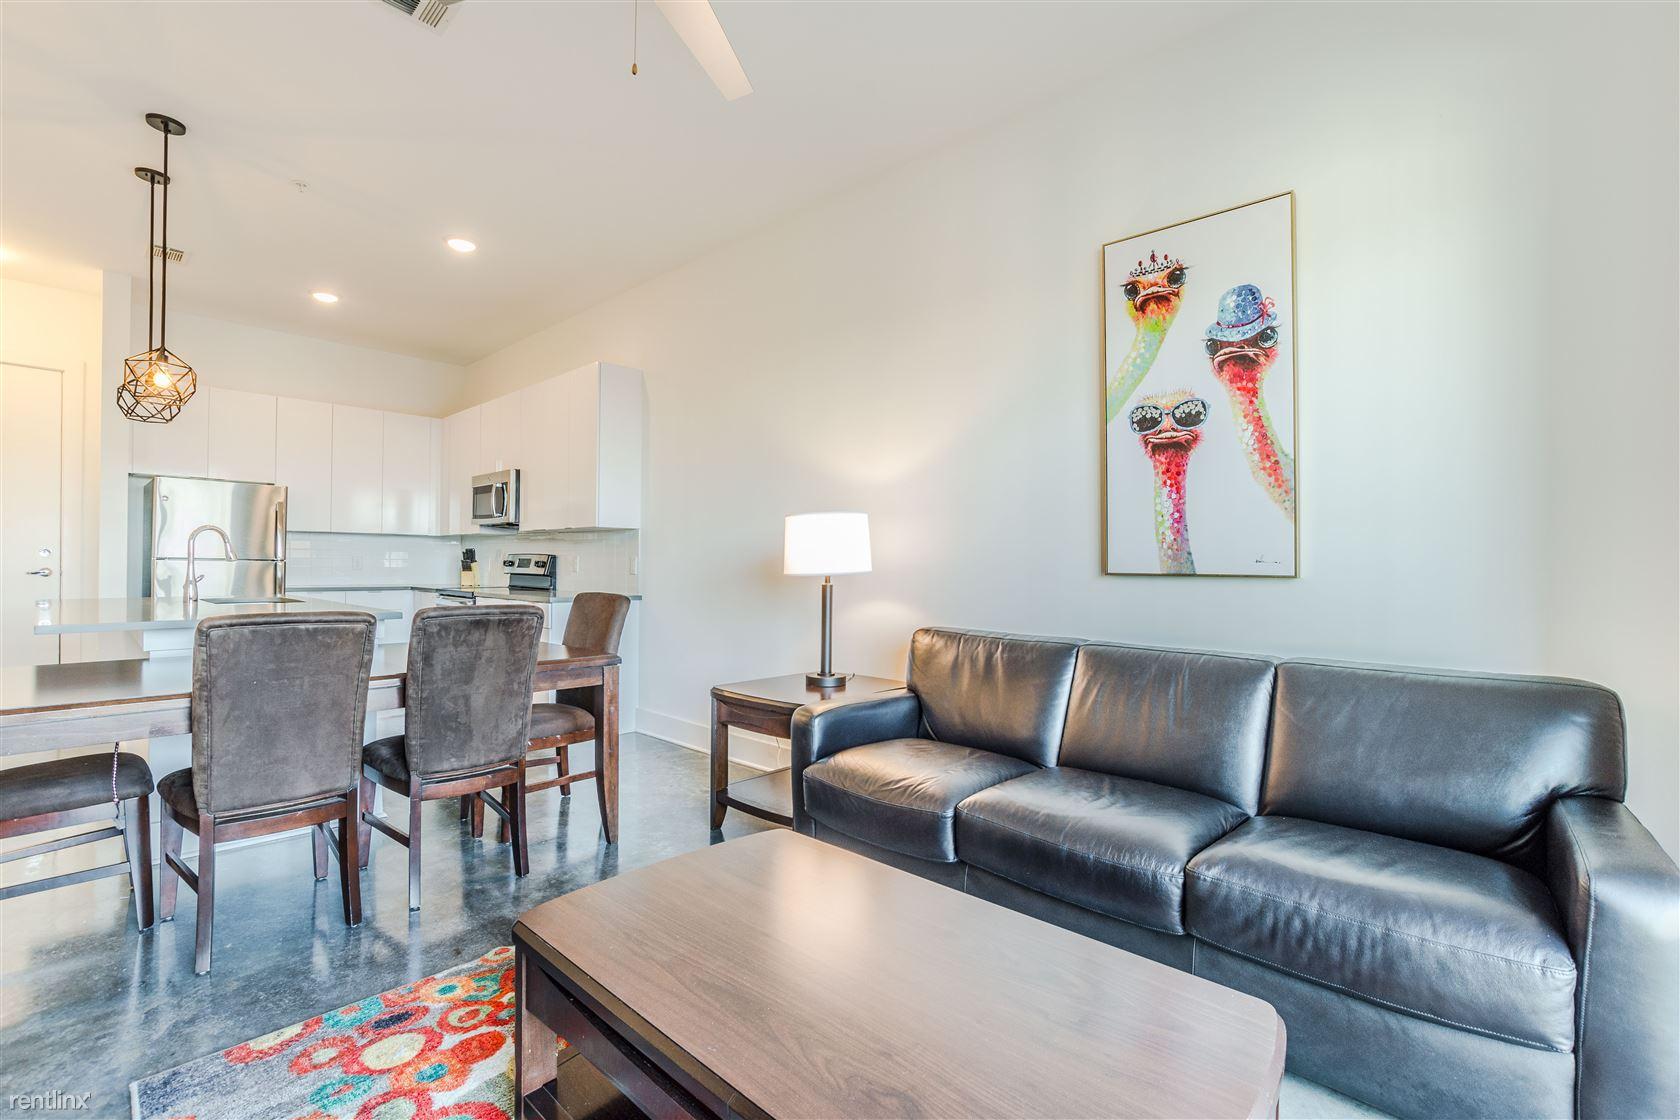 56 Gerrish Avenue, Chelsea, MA - $1,900